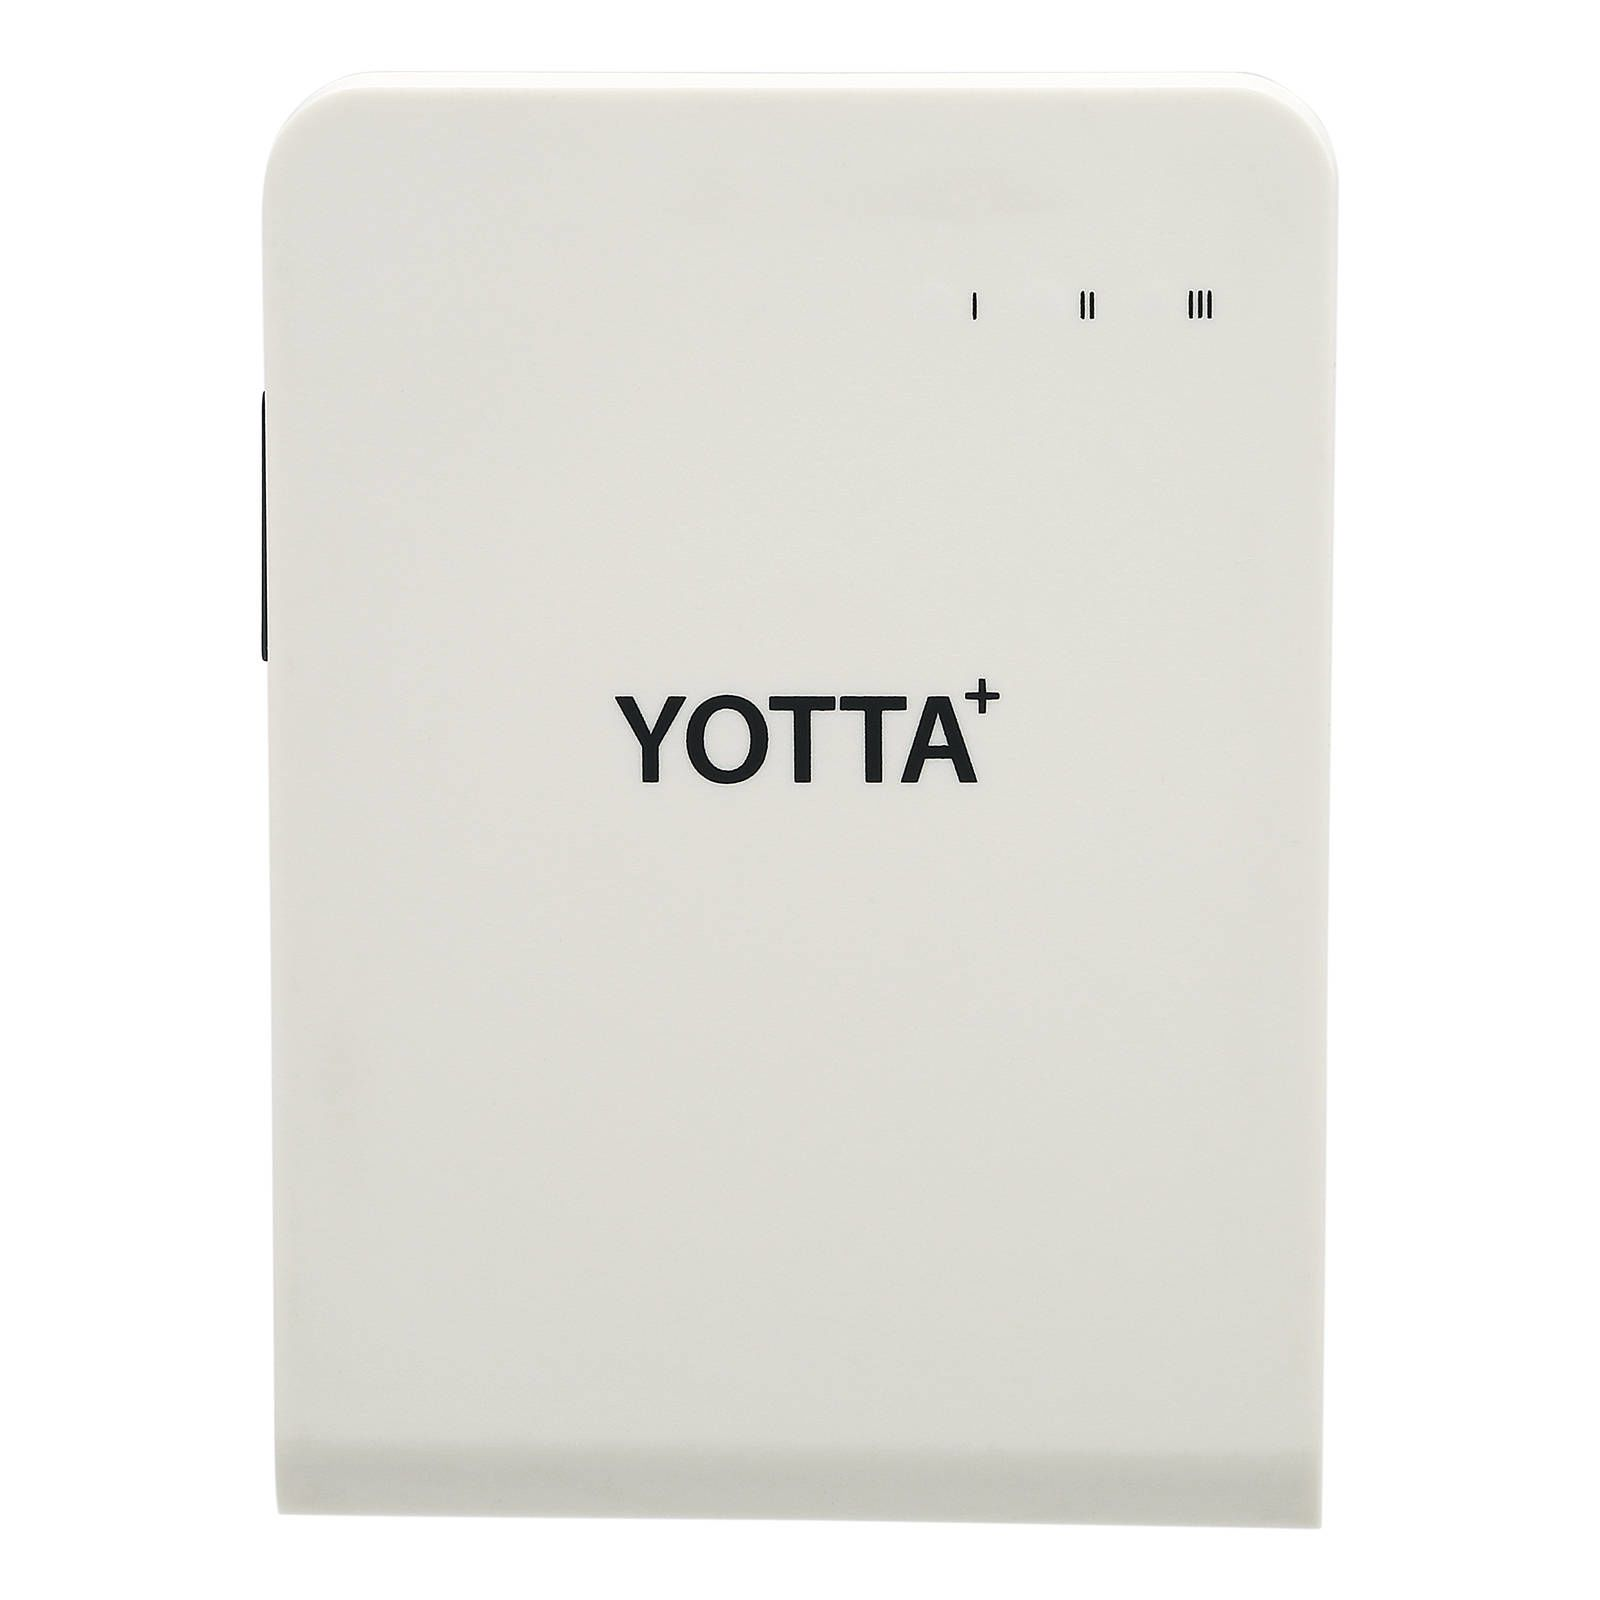 Twinstar Yotta Plus UV-sterilizer